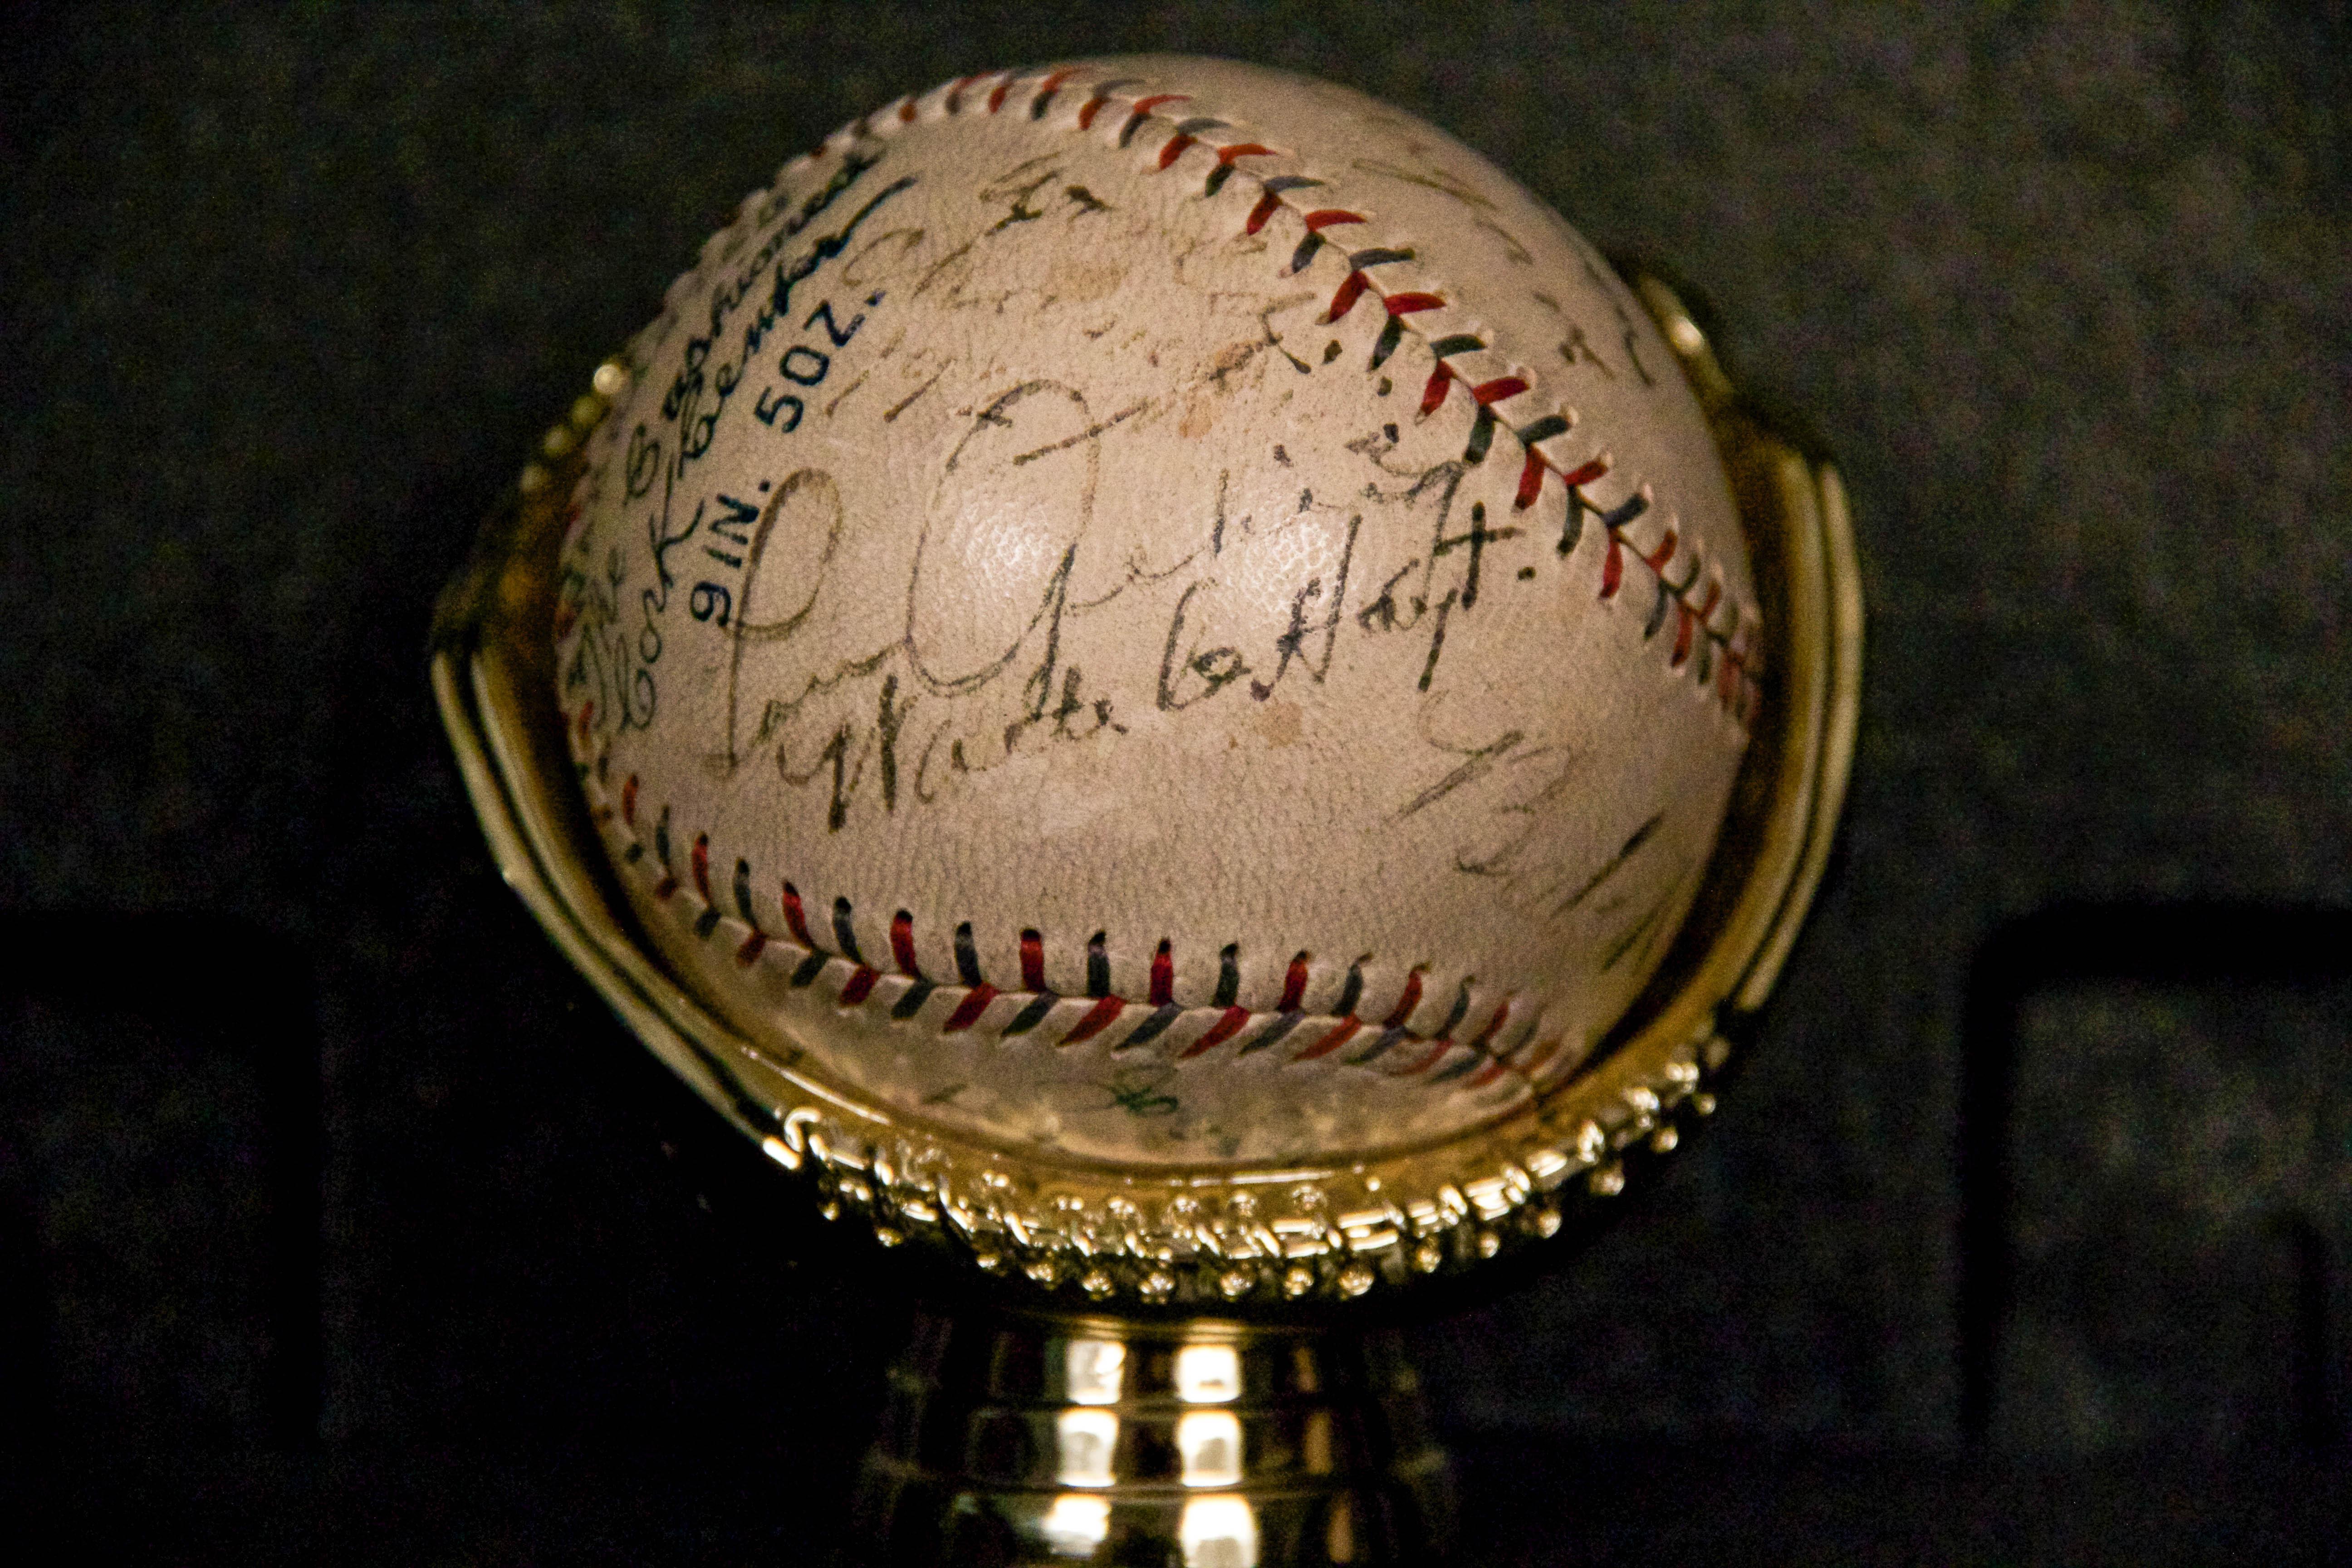 1928 World Series Champions